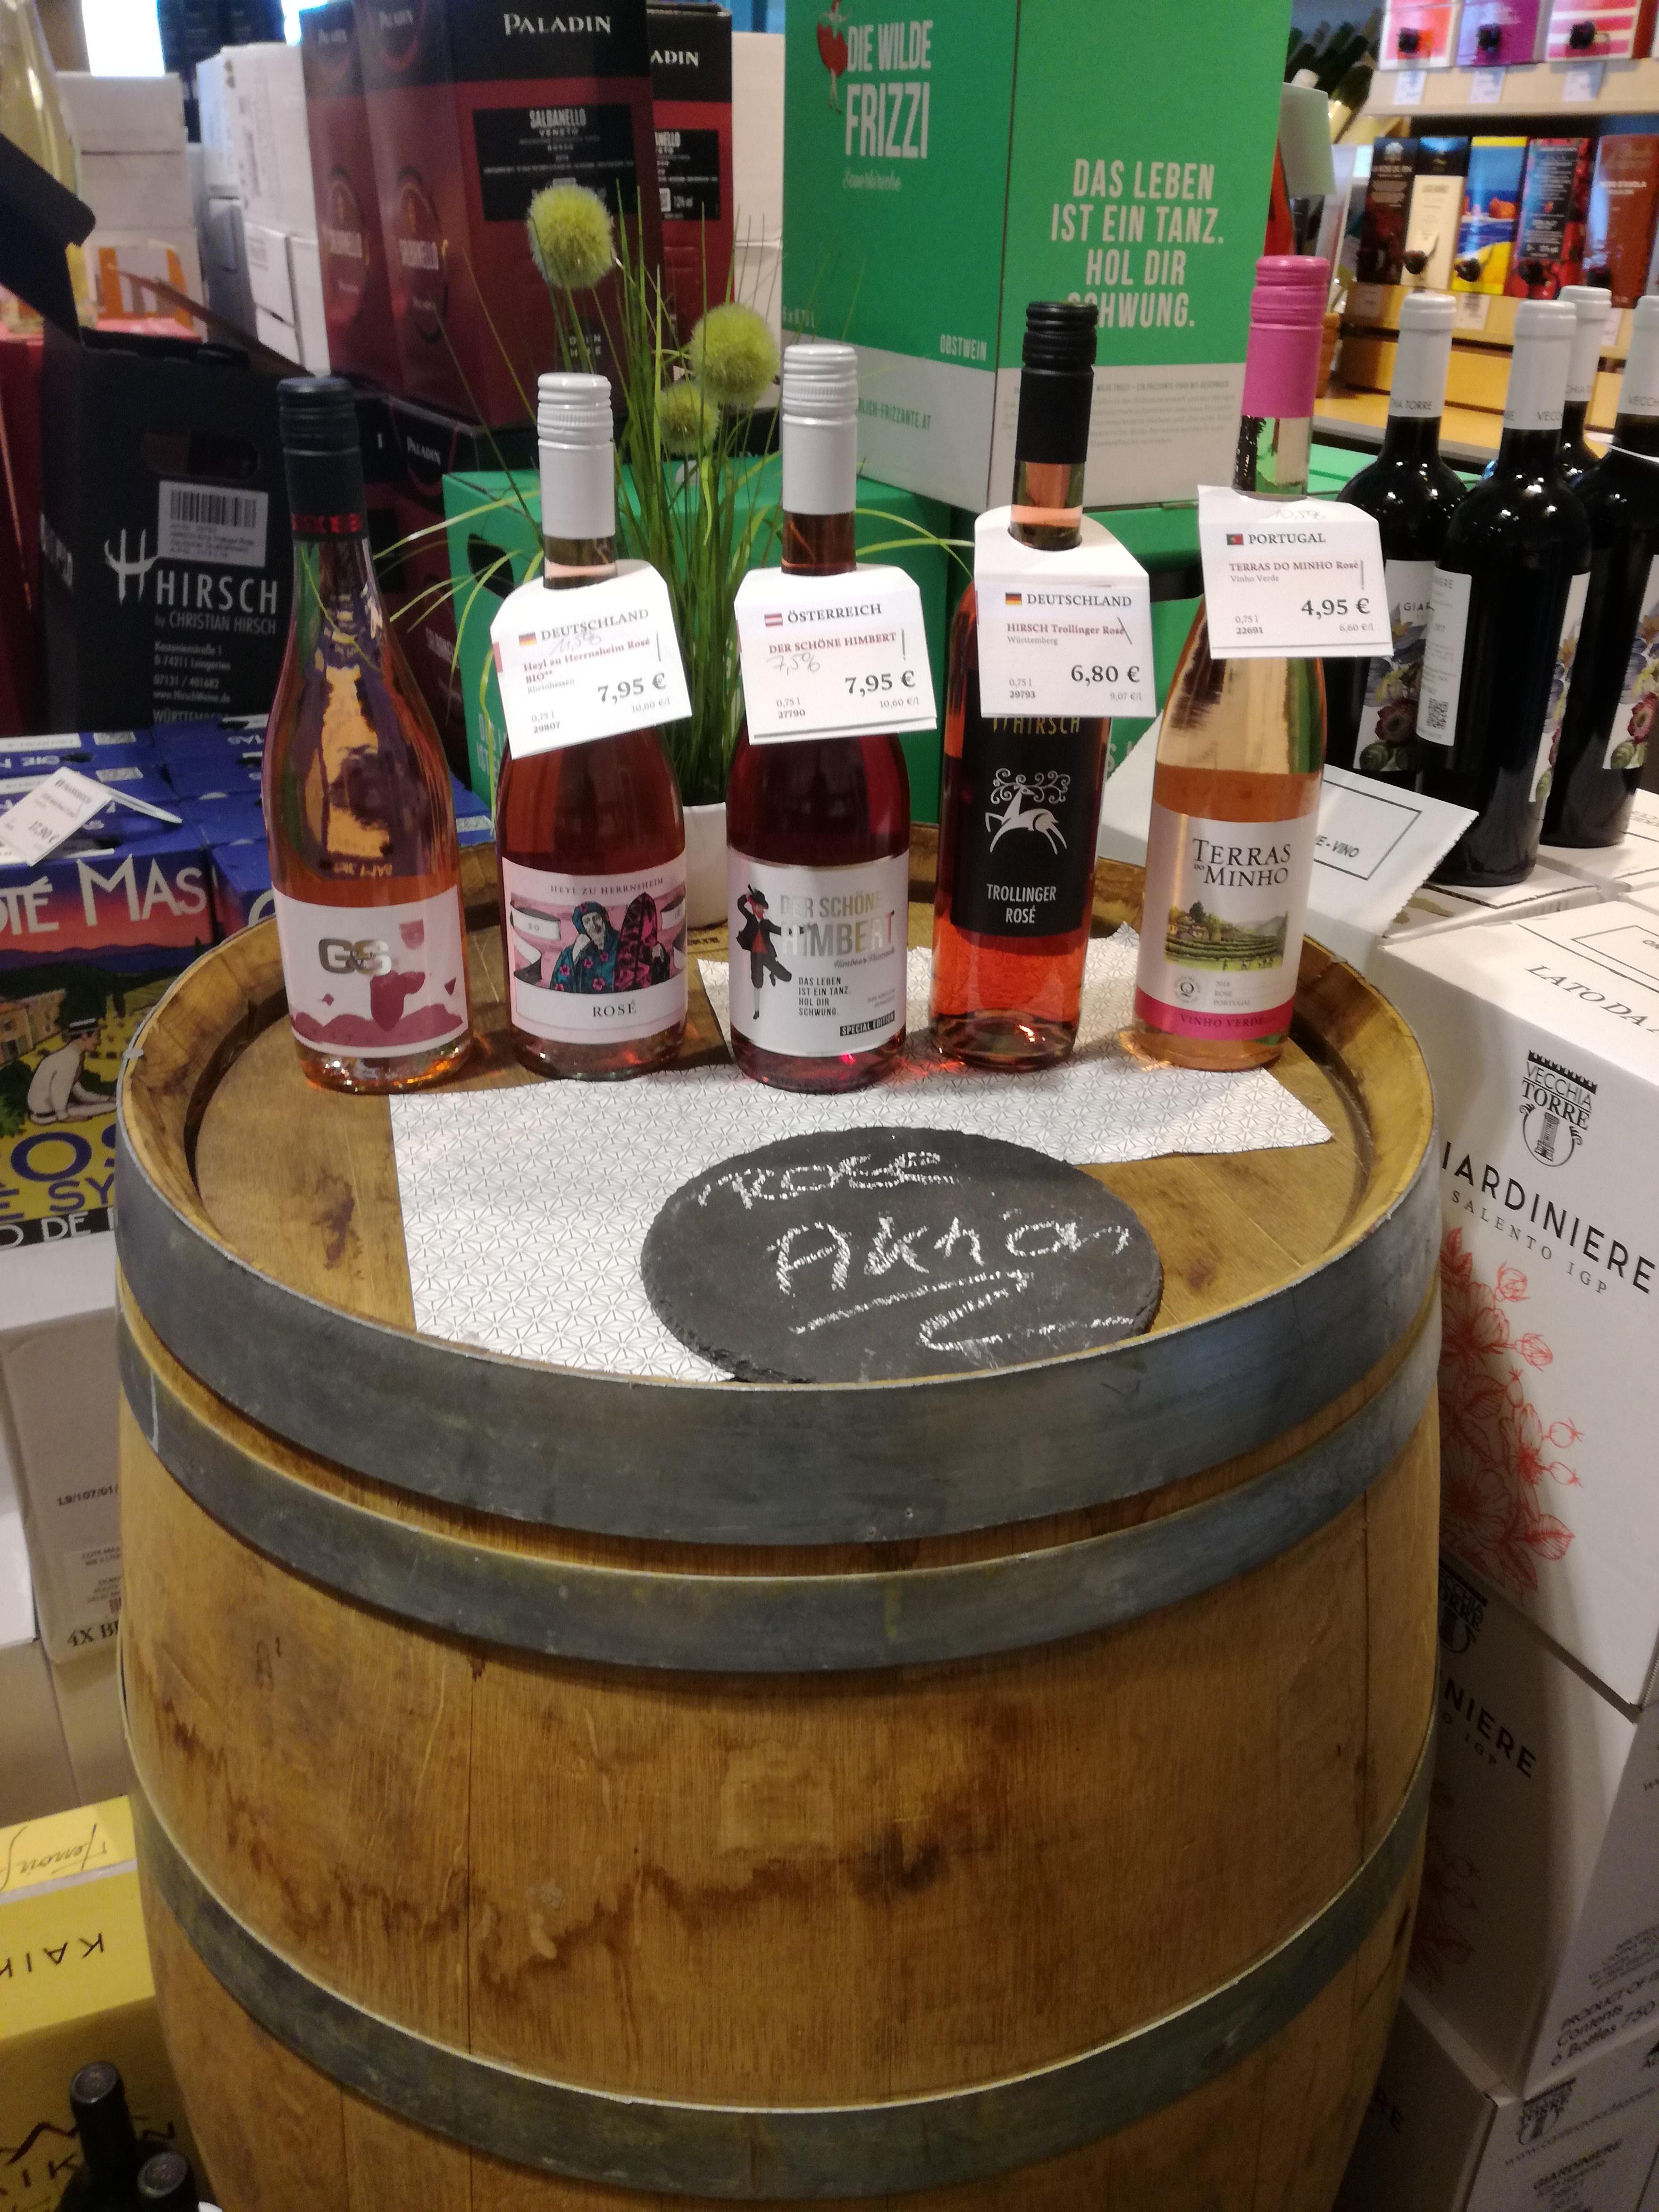 Jacques' Wein-Depot